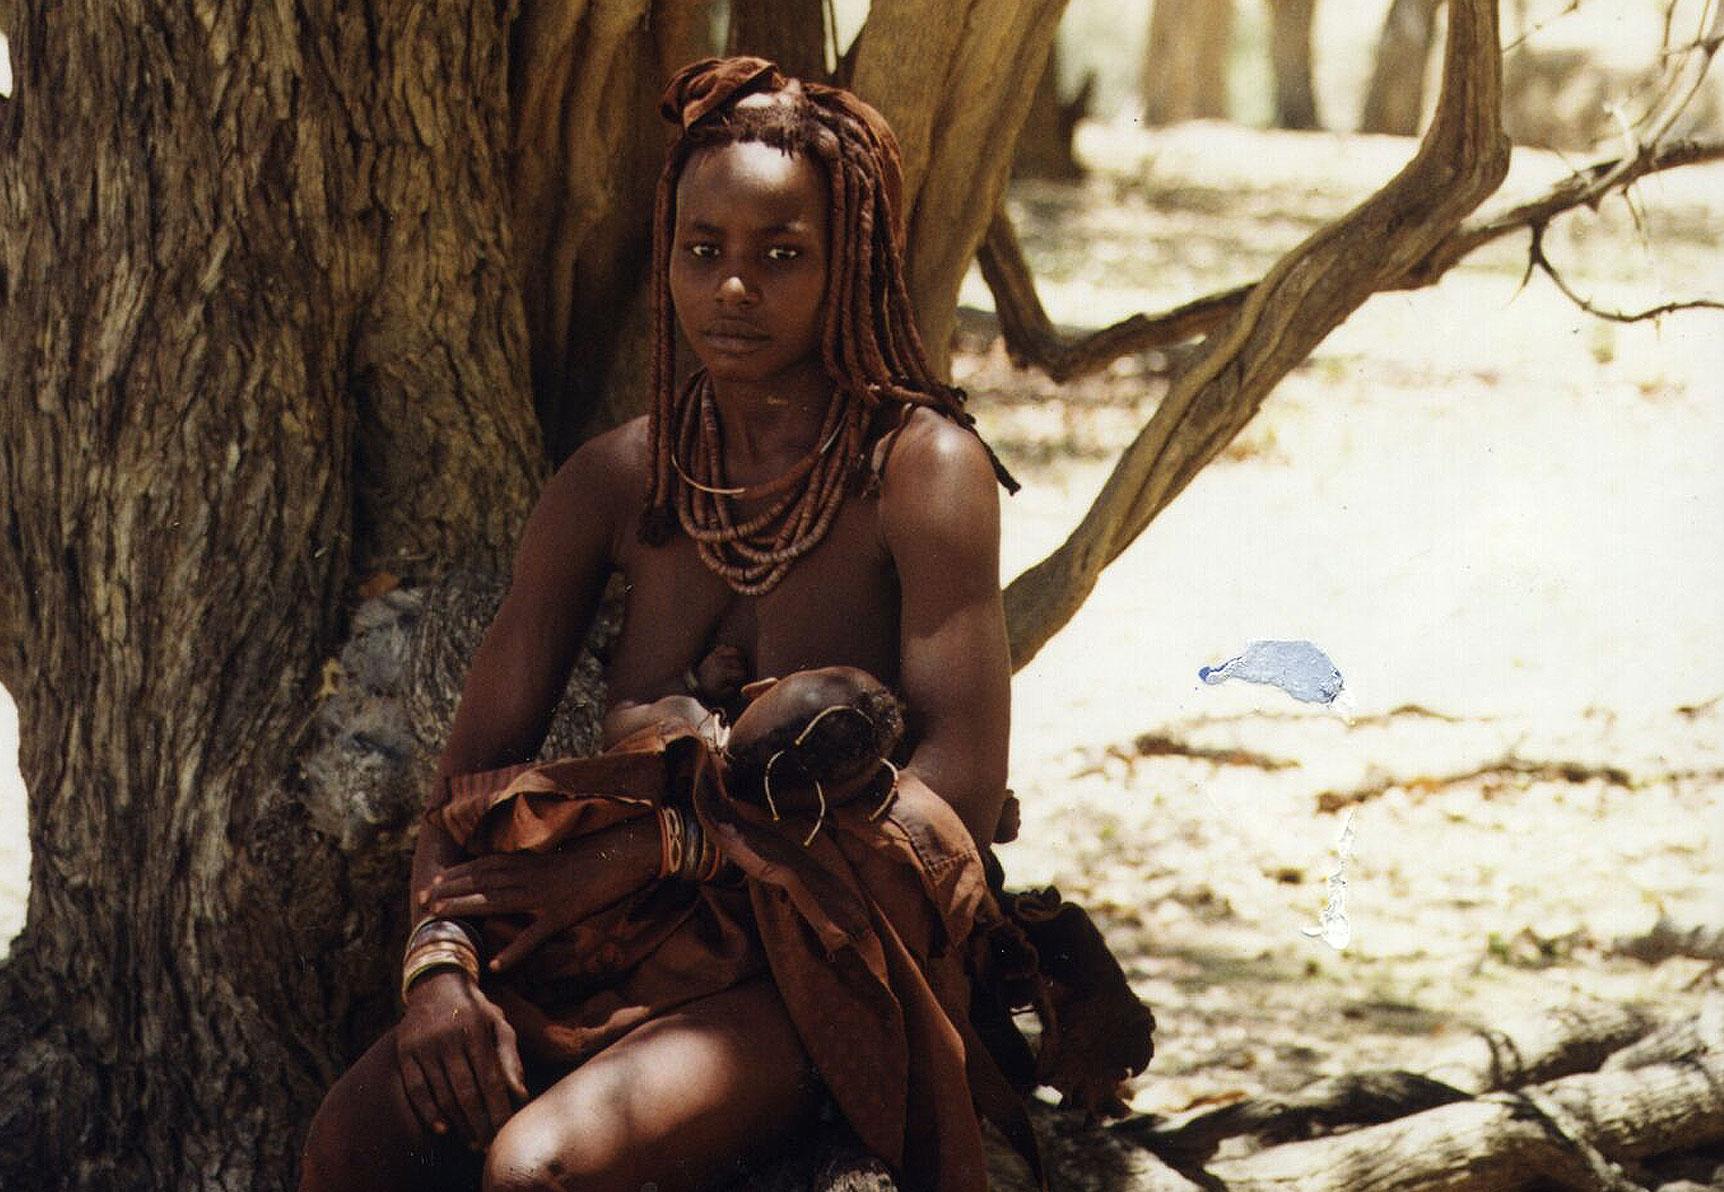 Namibia People inline image 5bfbea3137963